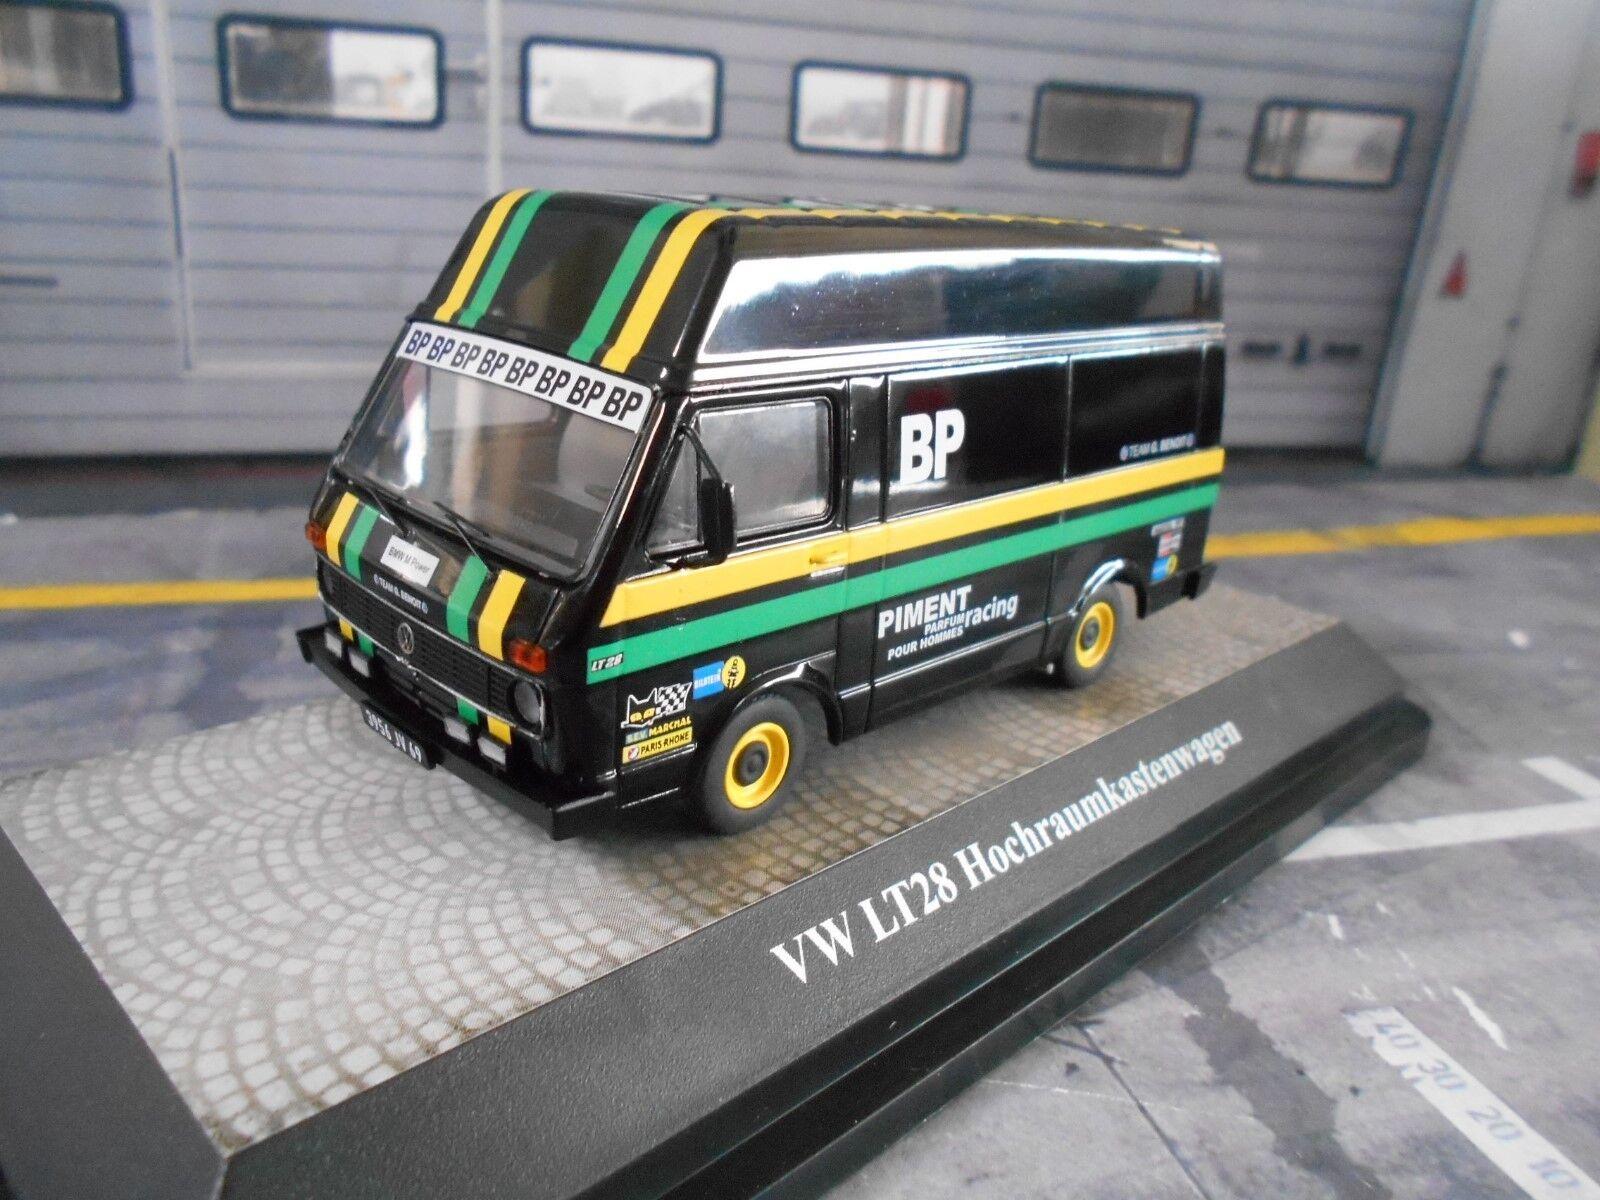 VW Volkswagen Bus lt28 LT VW Motorsport Hochraum encadré voiture Benoit BP SP 1 43